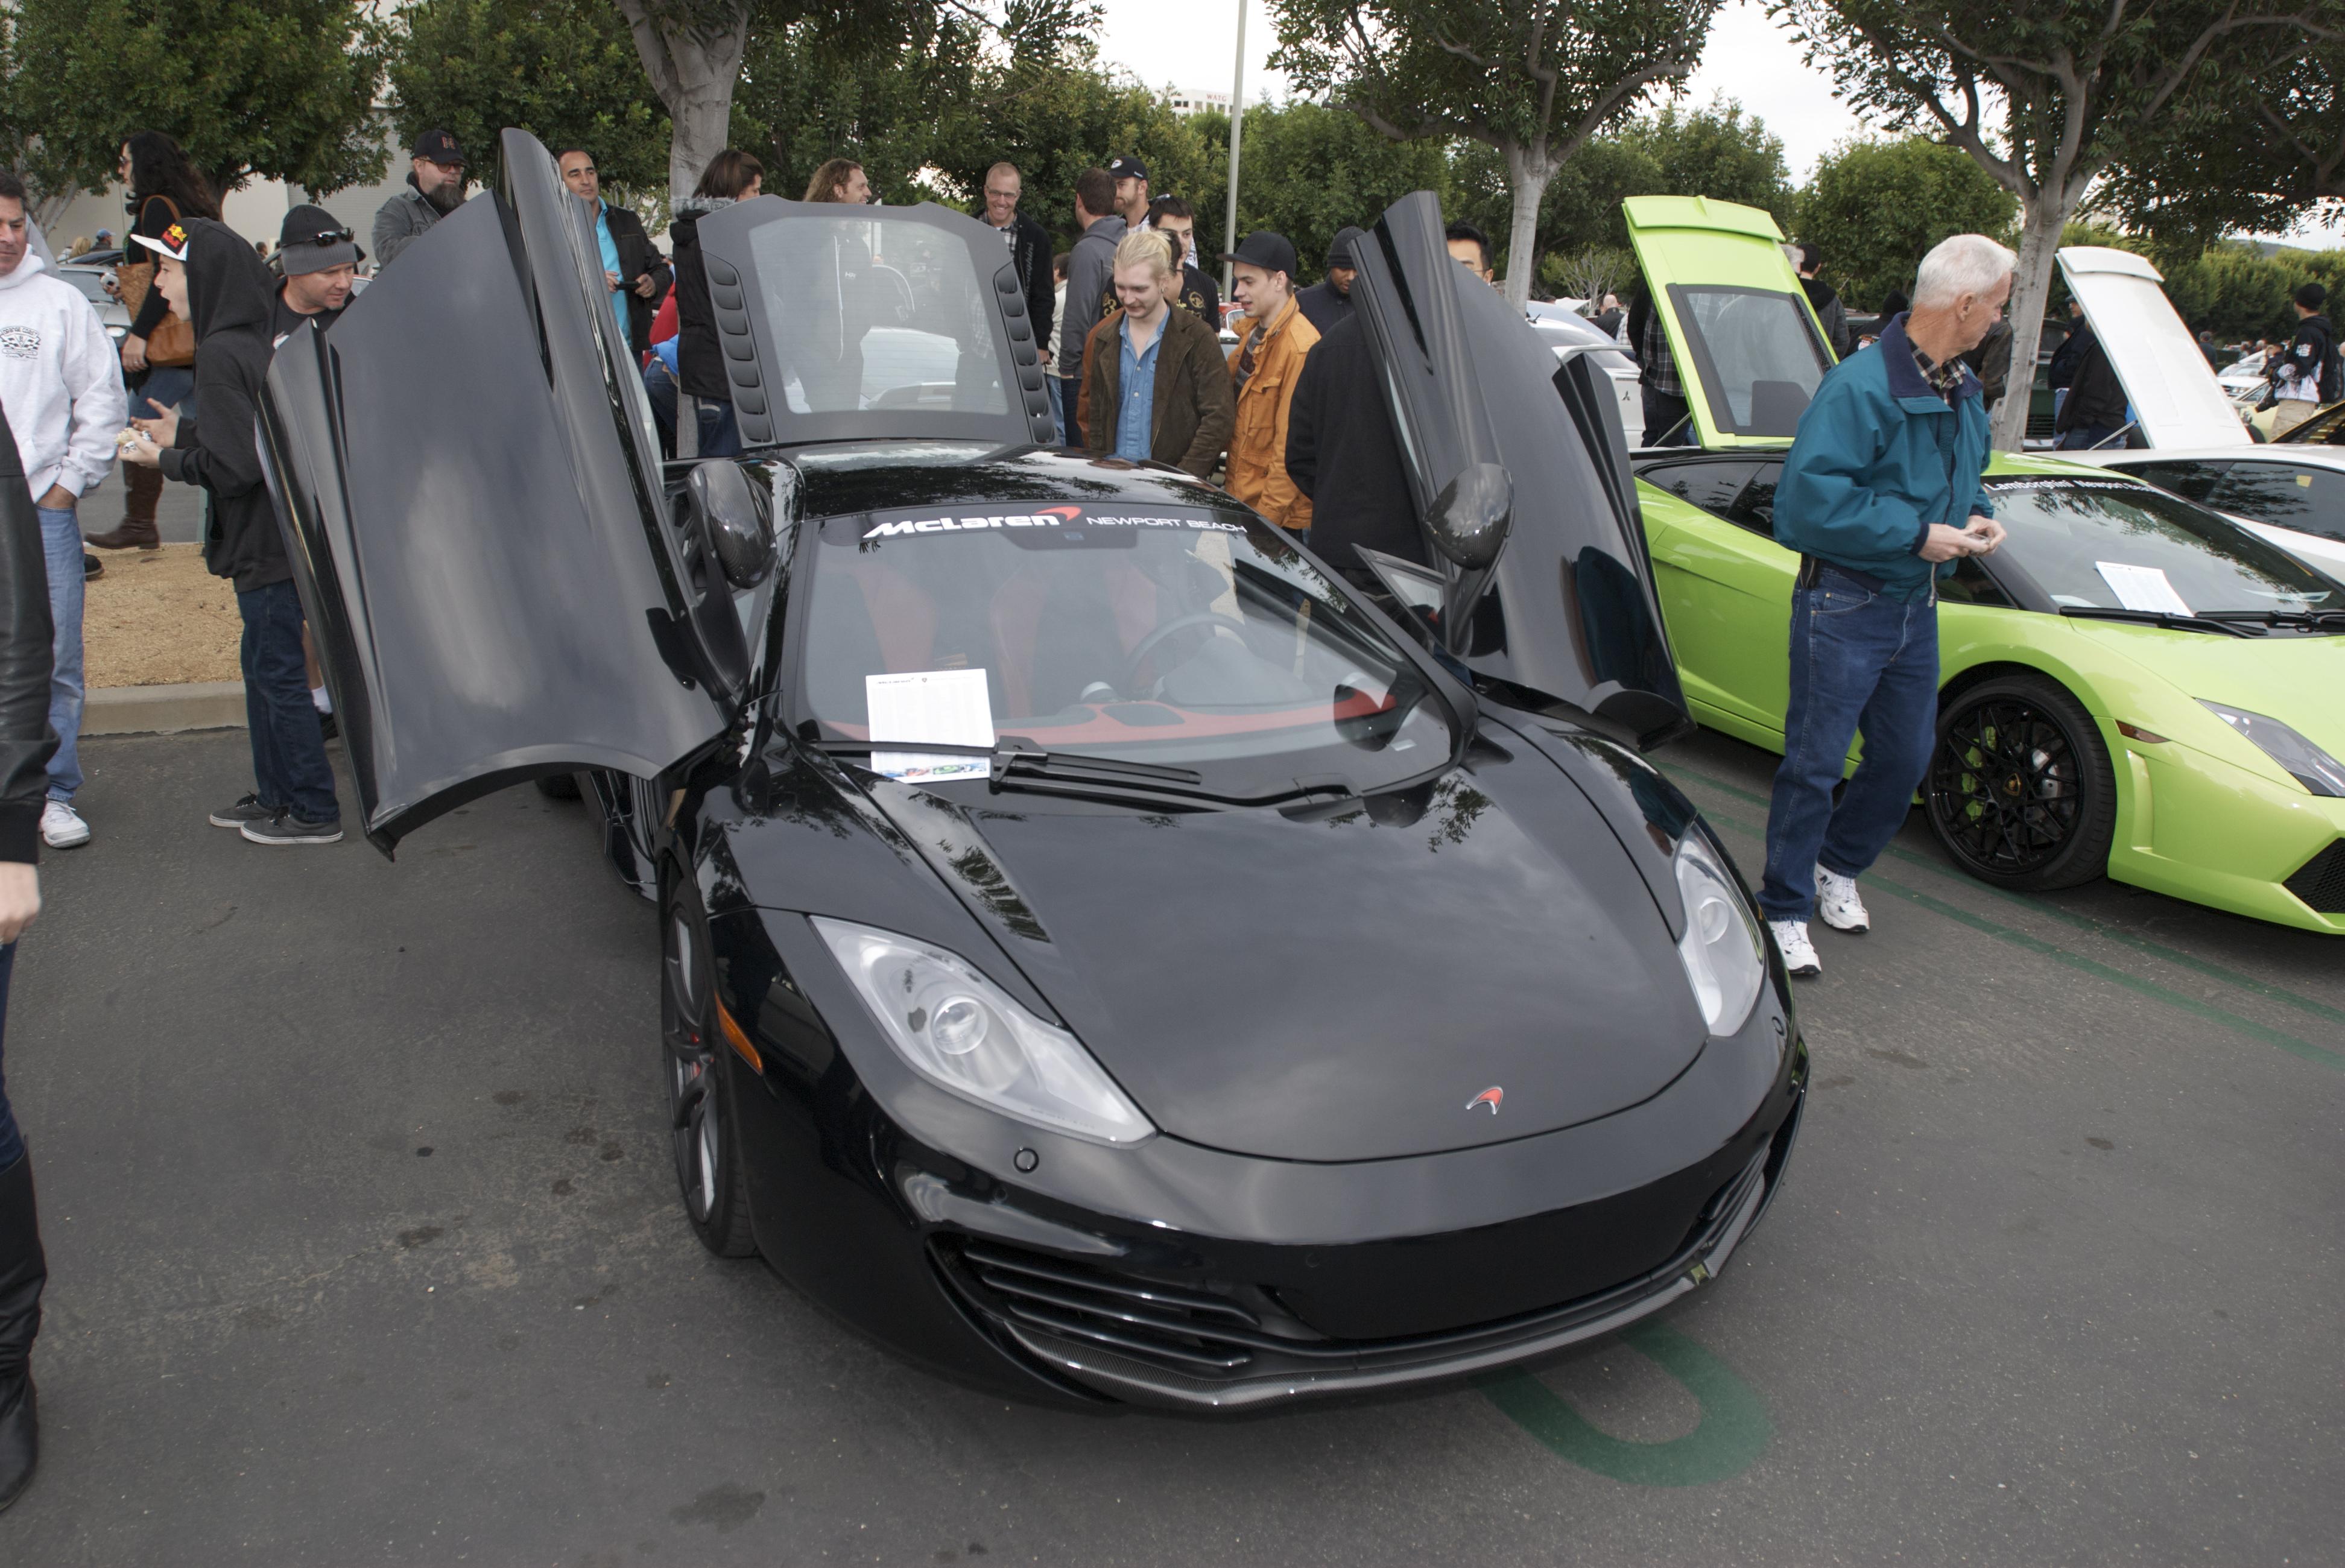 Black McLaren MP4 12C_Carsu0026Coffee/Irvine_1/14/12